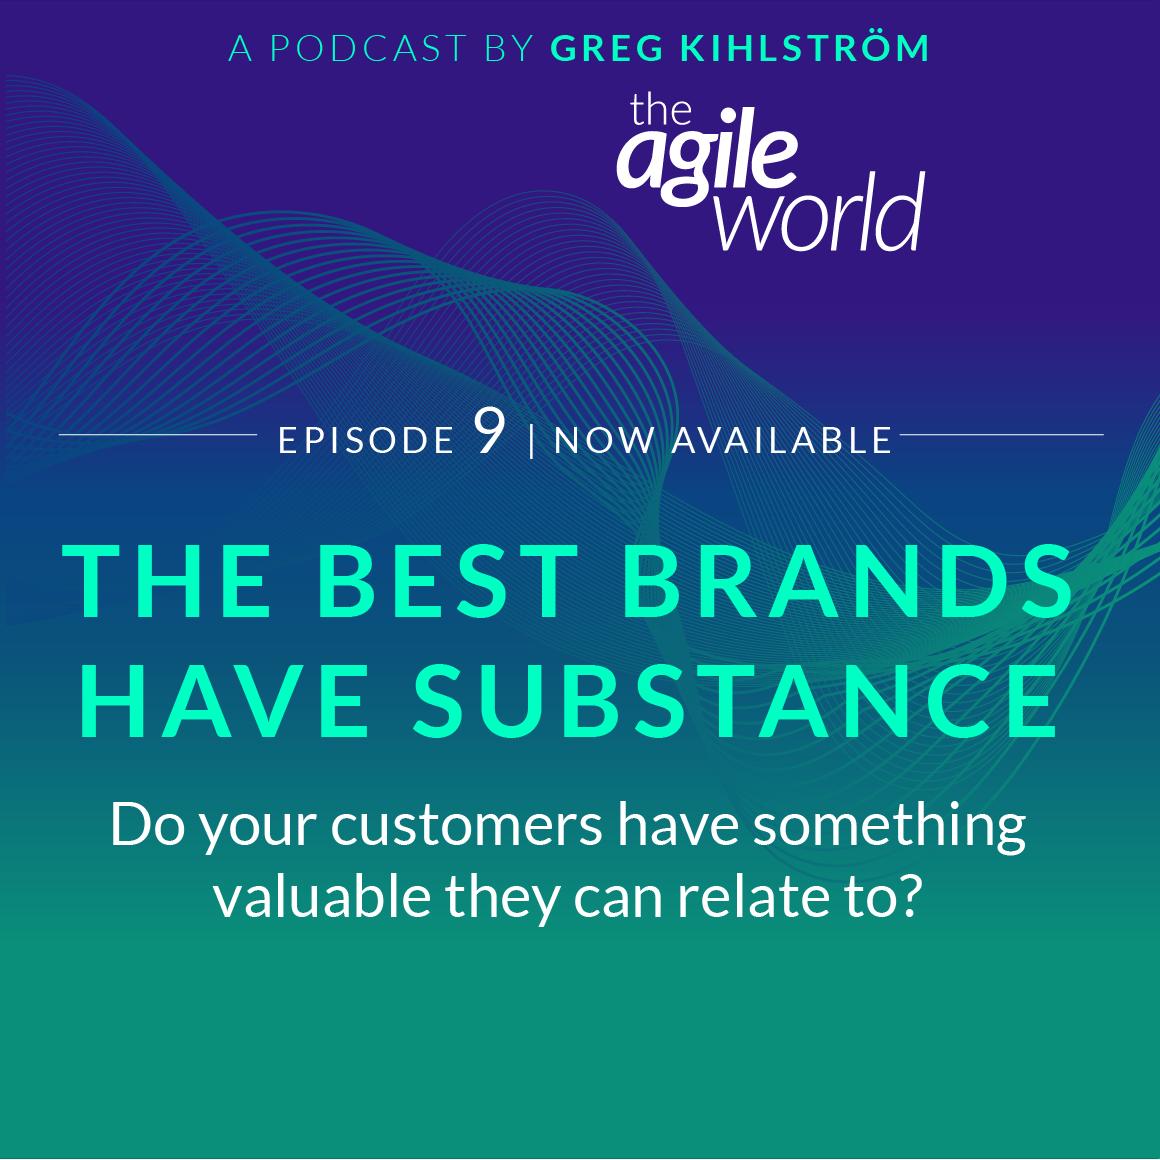 the-agile-world-episode-9